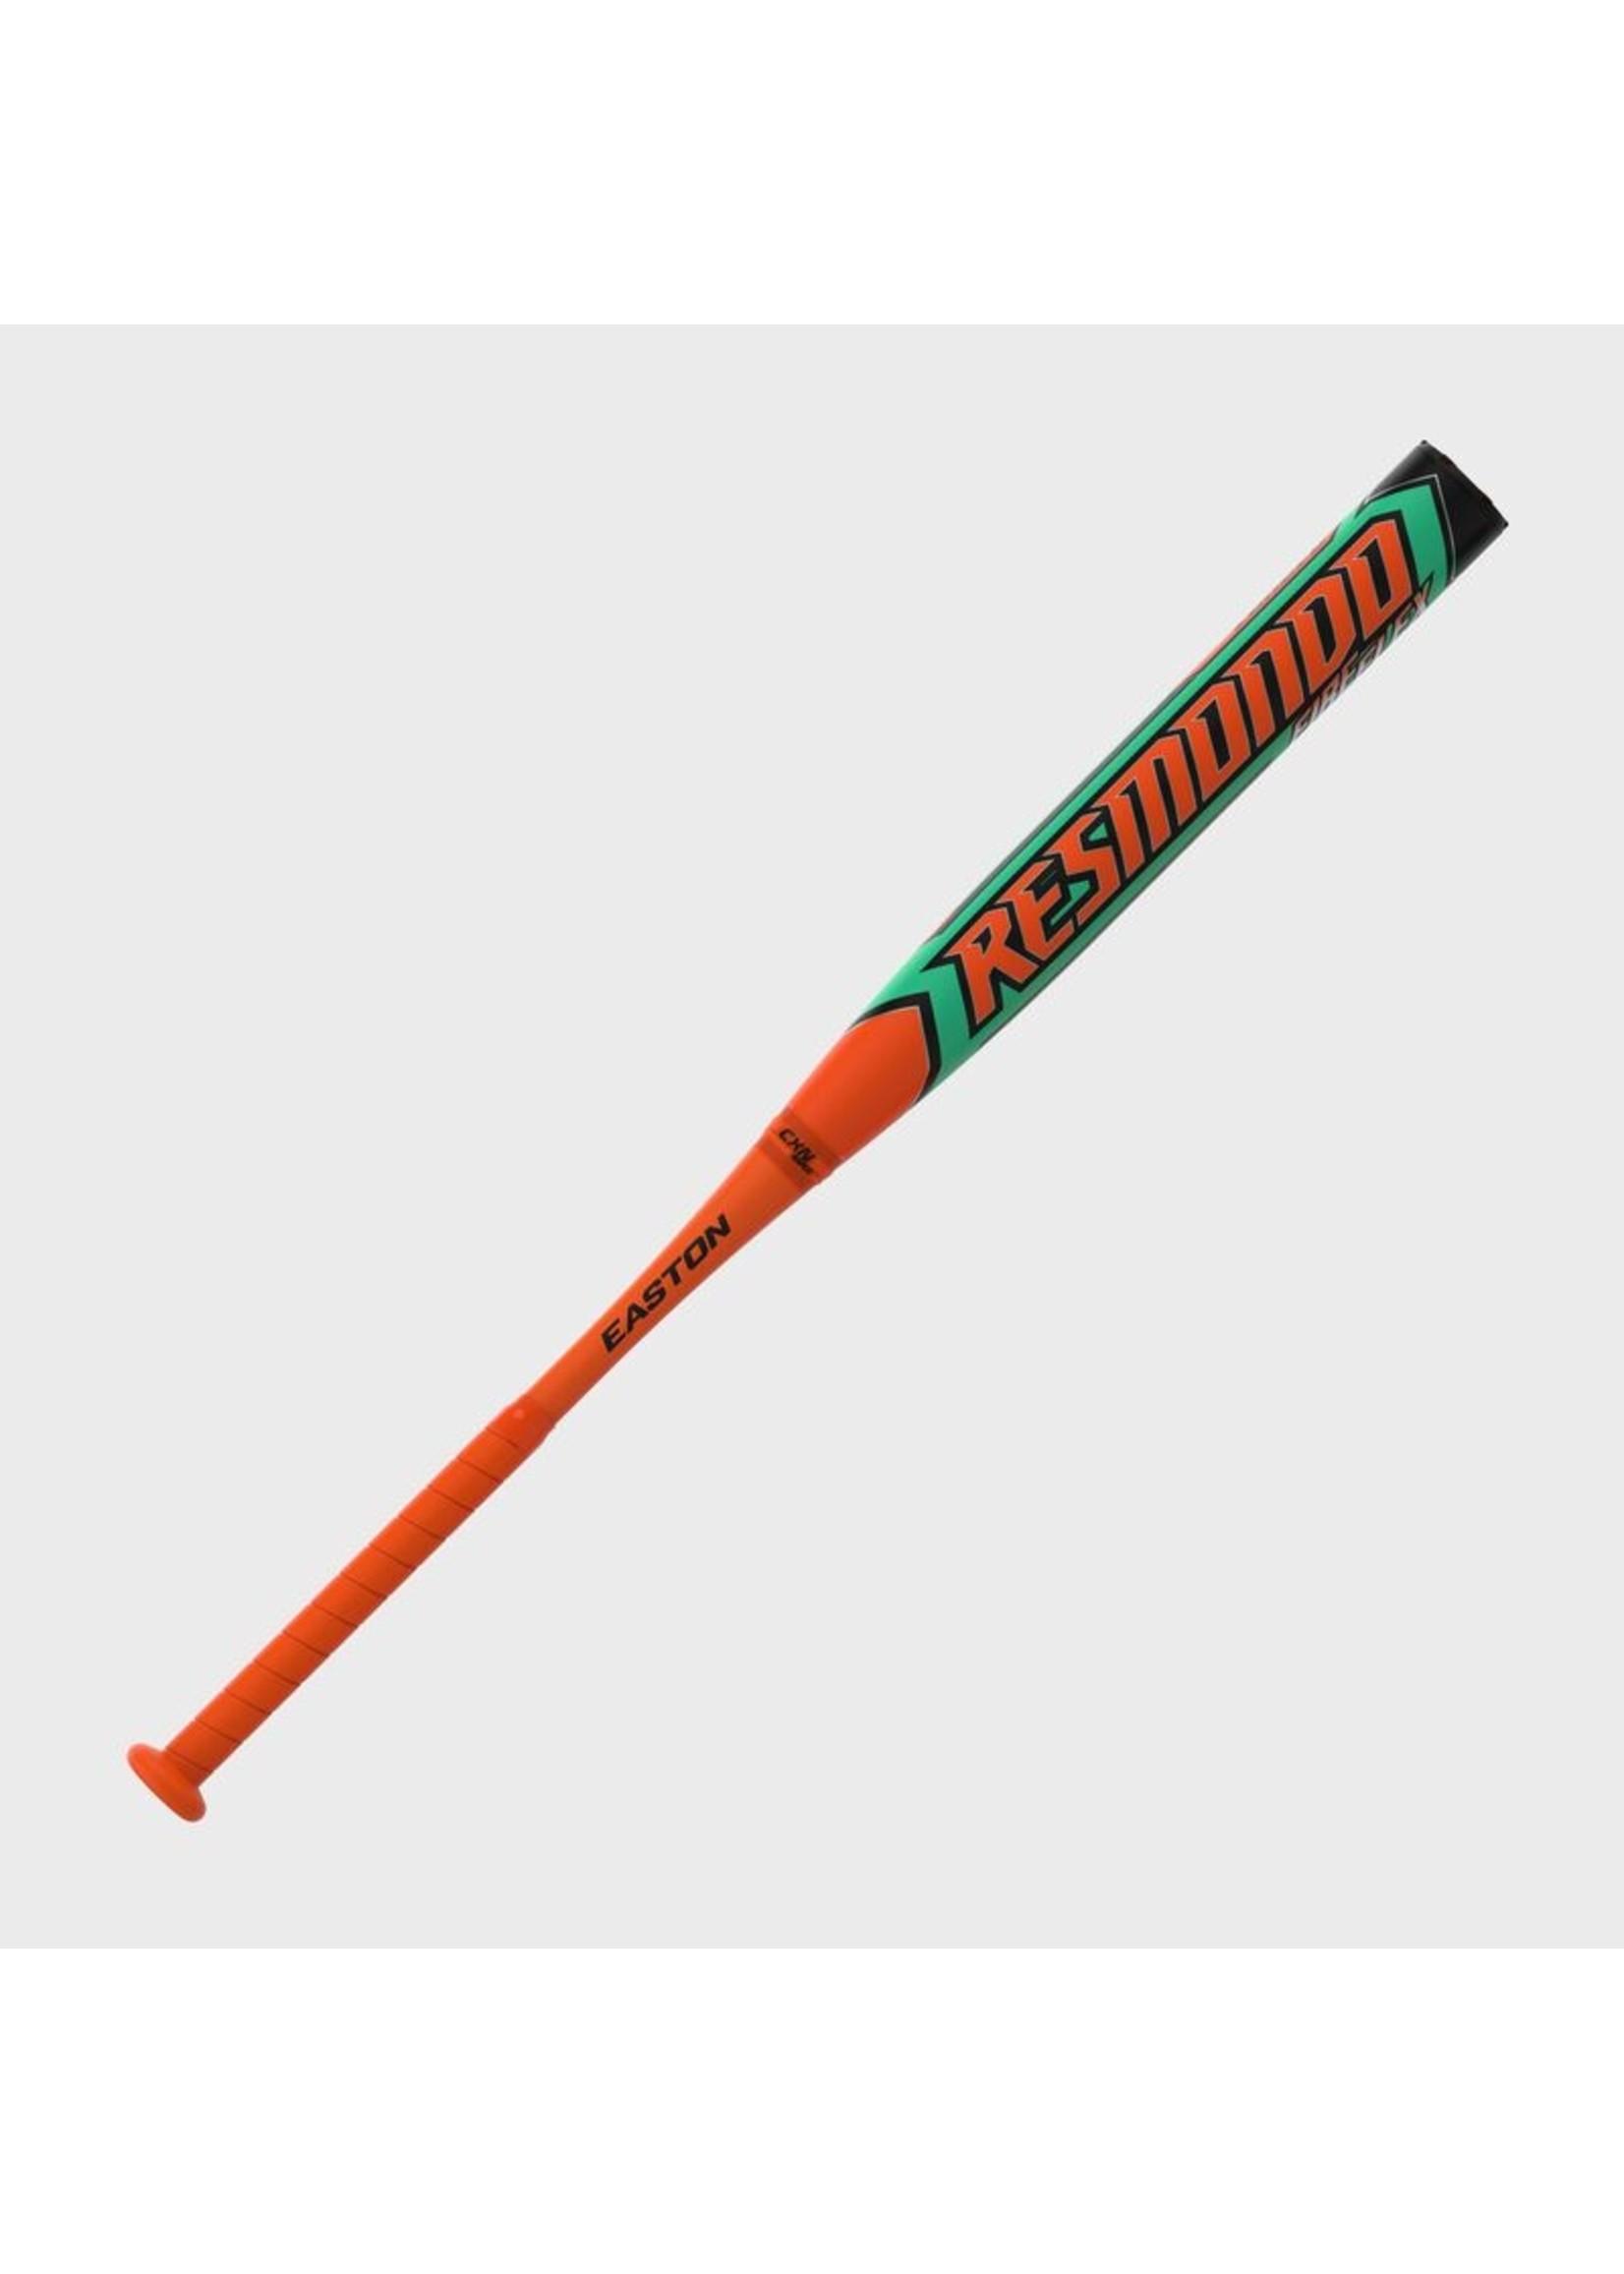 Easton Baseball (Canada) EASTON FIREFLEX RESMONDO 2022 END LOAD